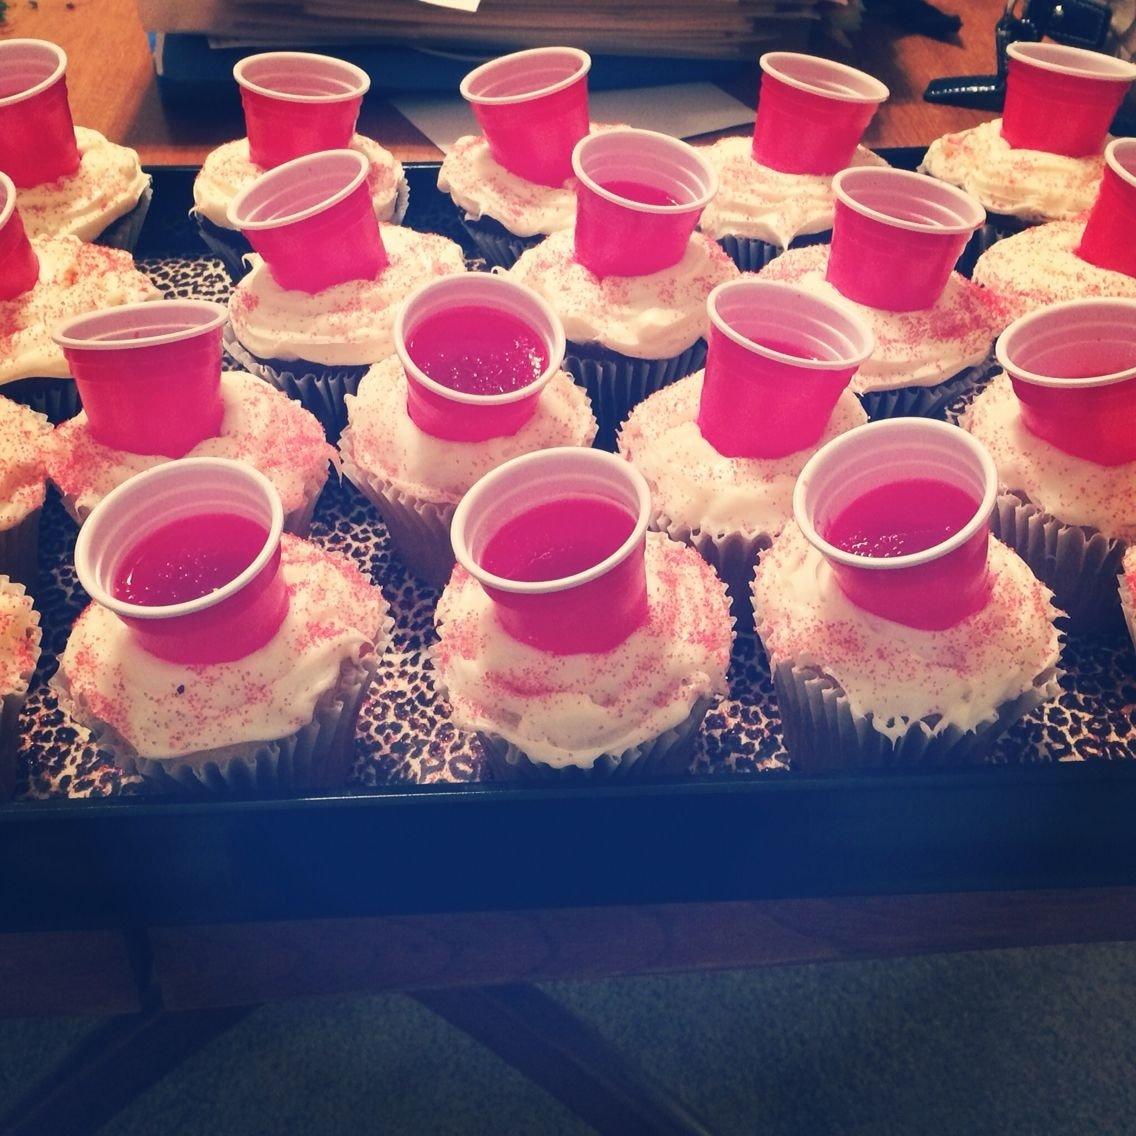 10 Amazing Party Ideas For 21St Birthday cupcakes i made for my sisters 21st birthday large cupcakes that i 2021